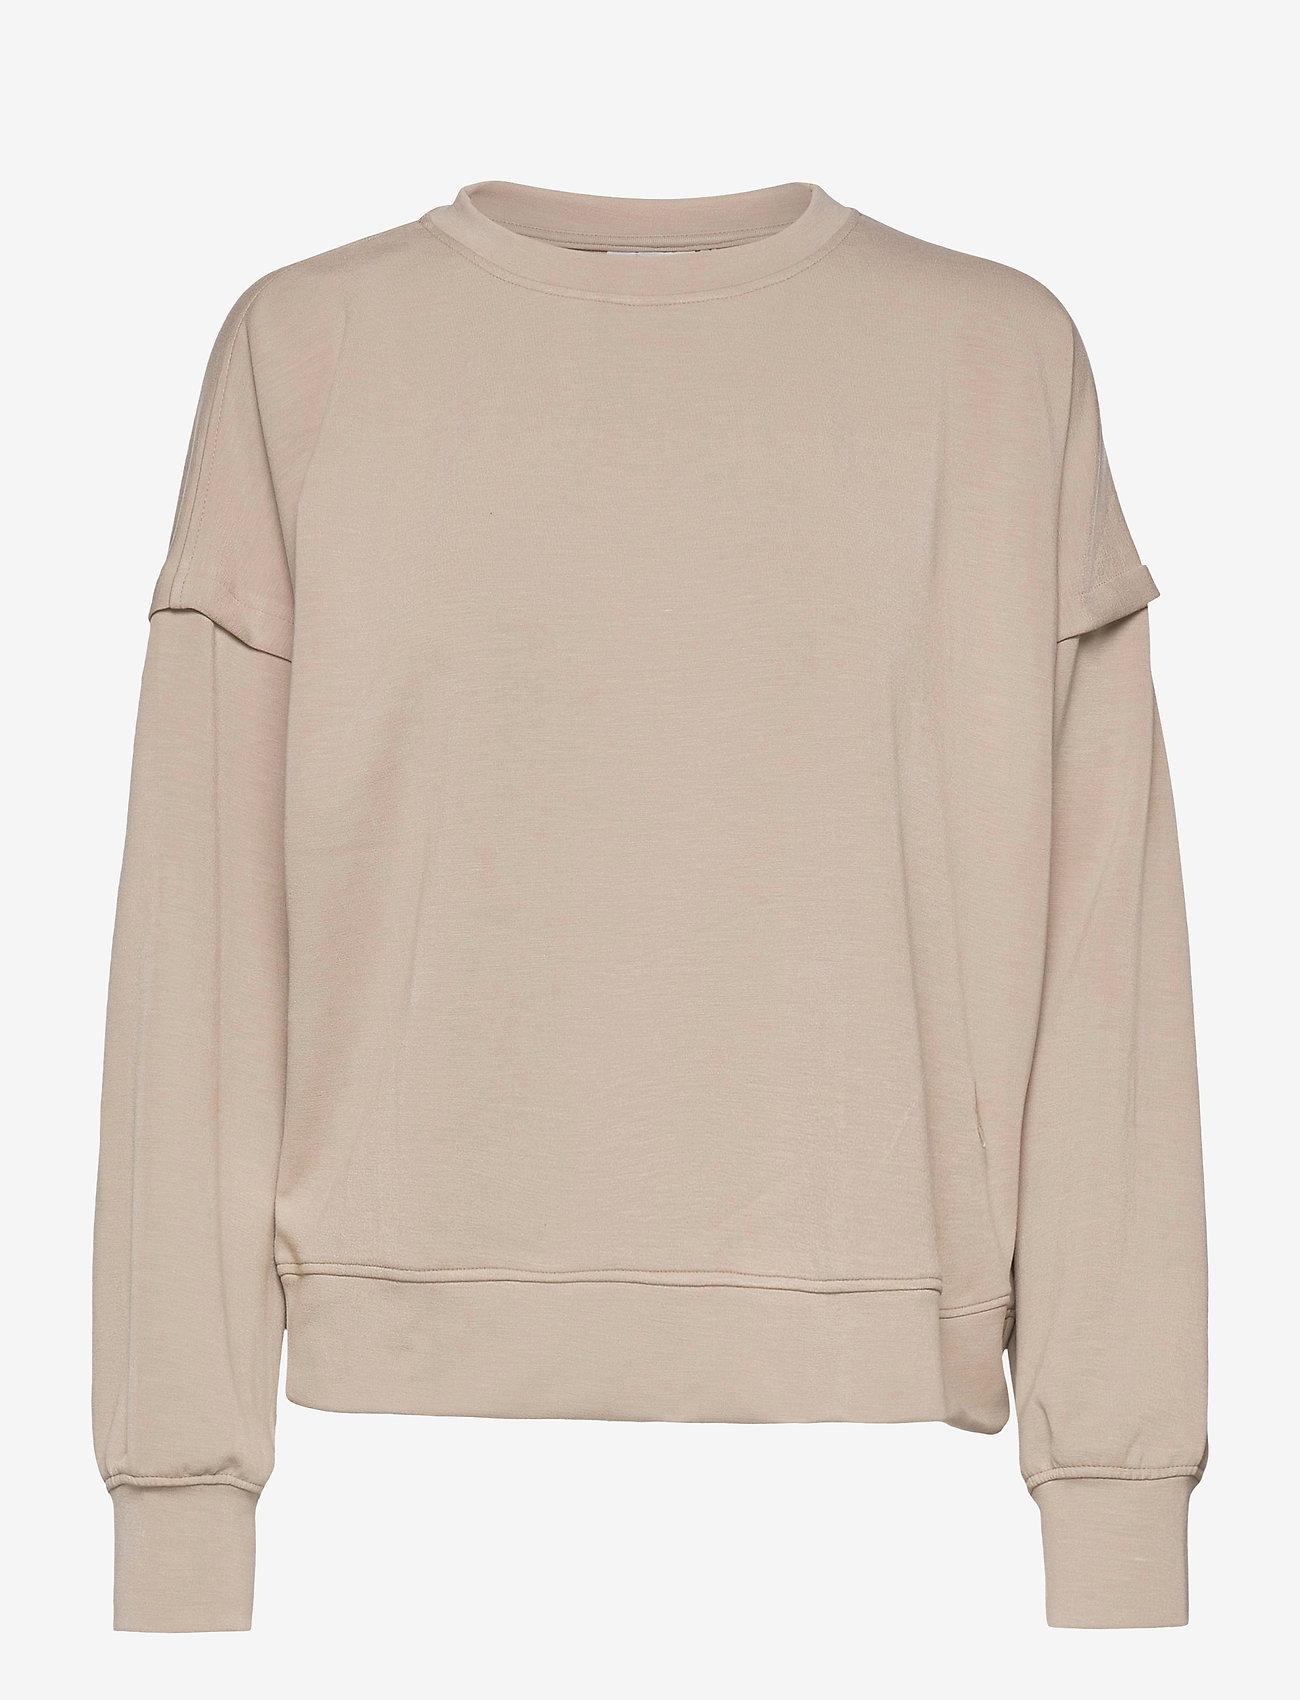 Gestuz - ChrisdaGZ sweatshirt - sweatshirts - pure cashmere - 1